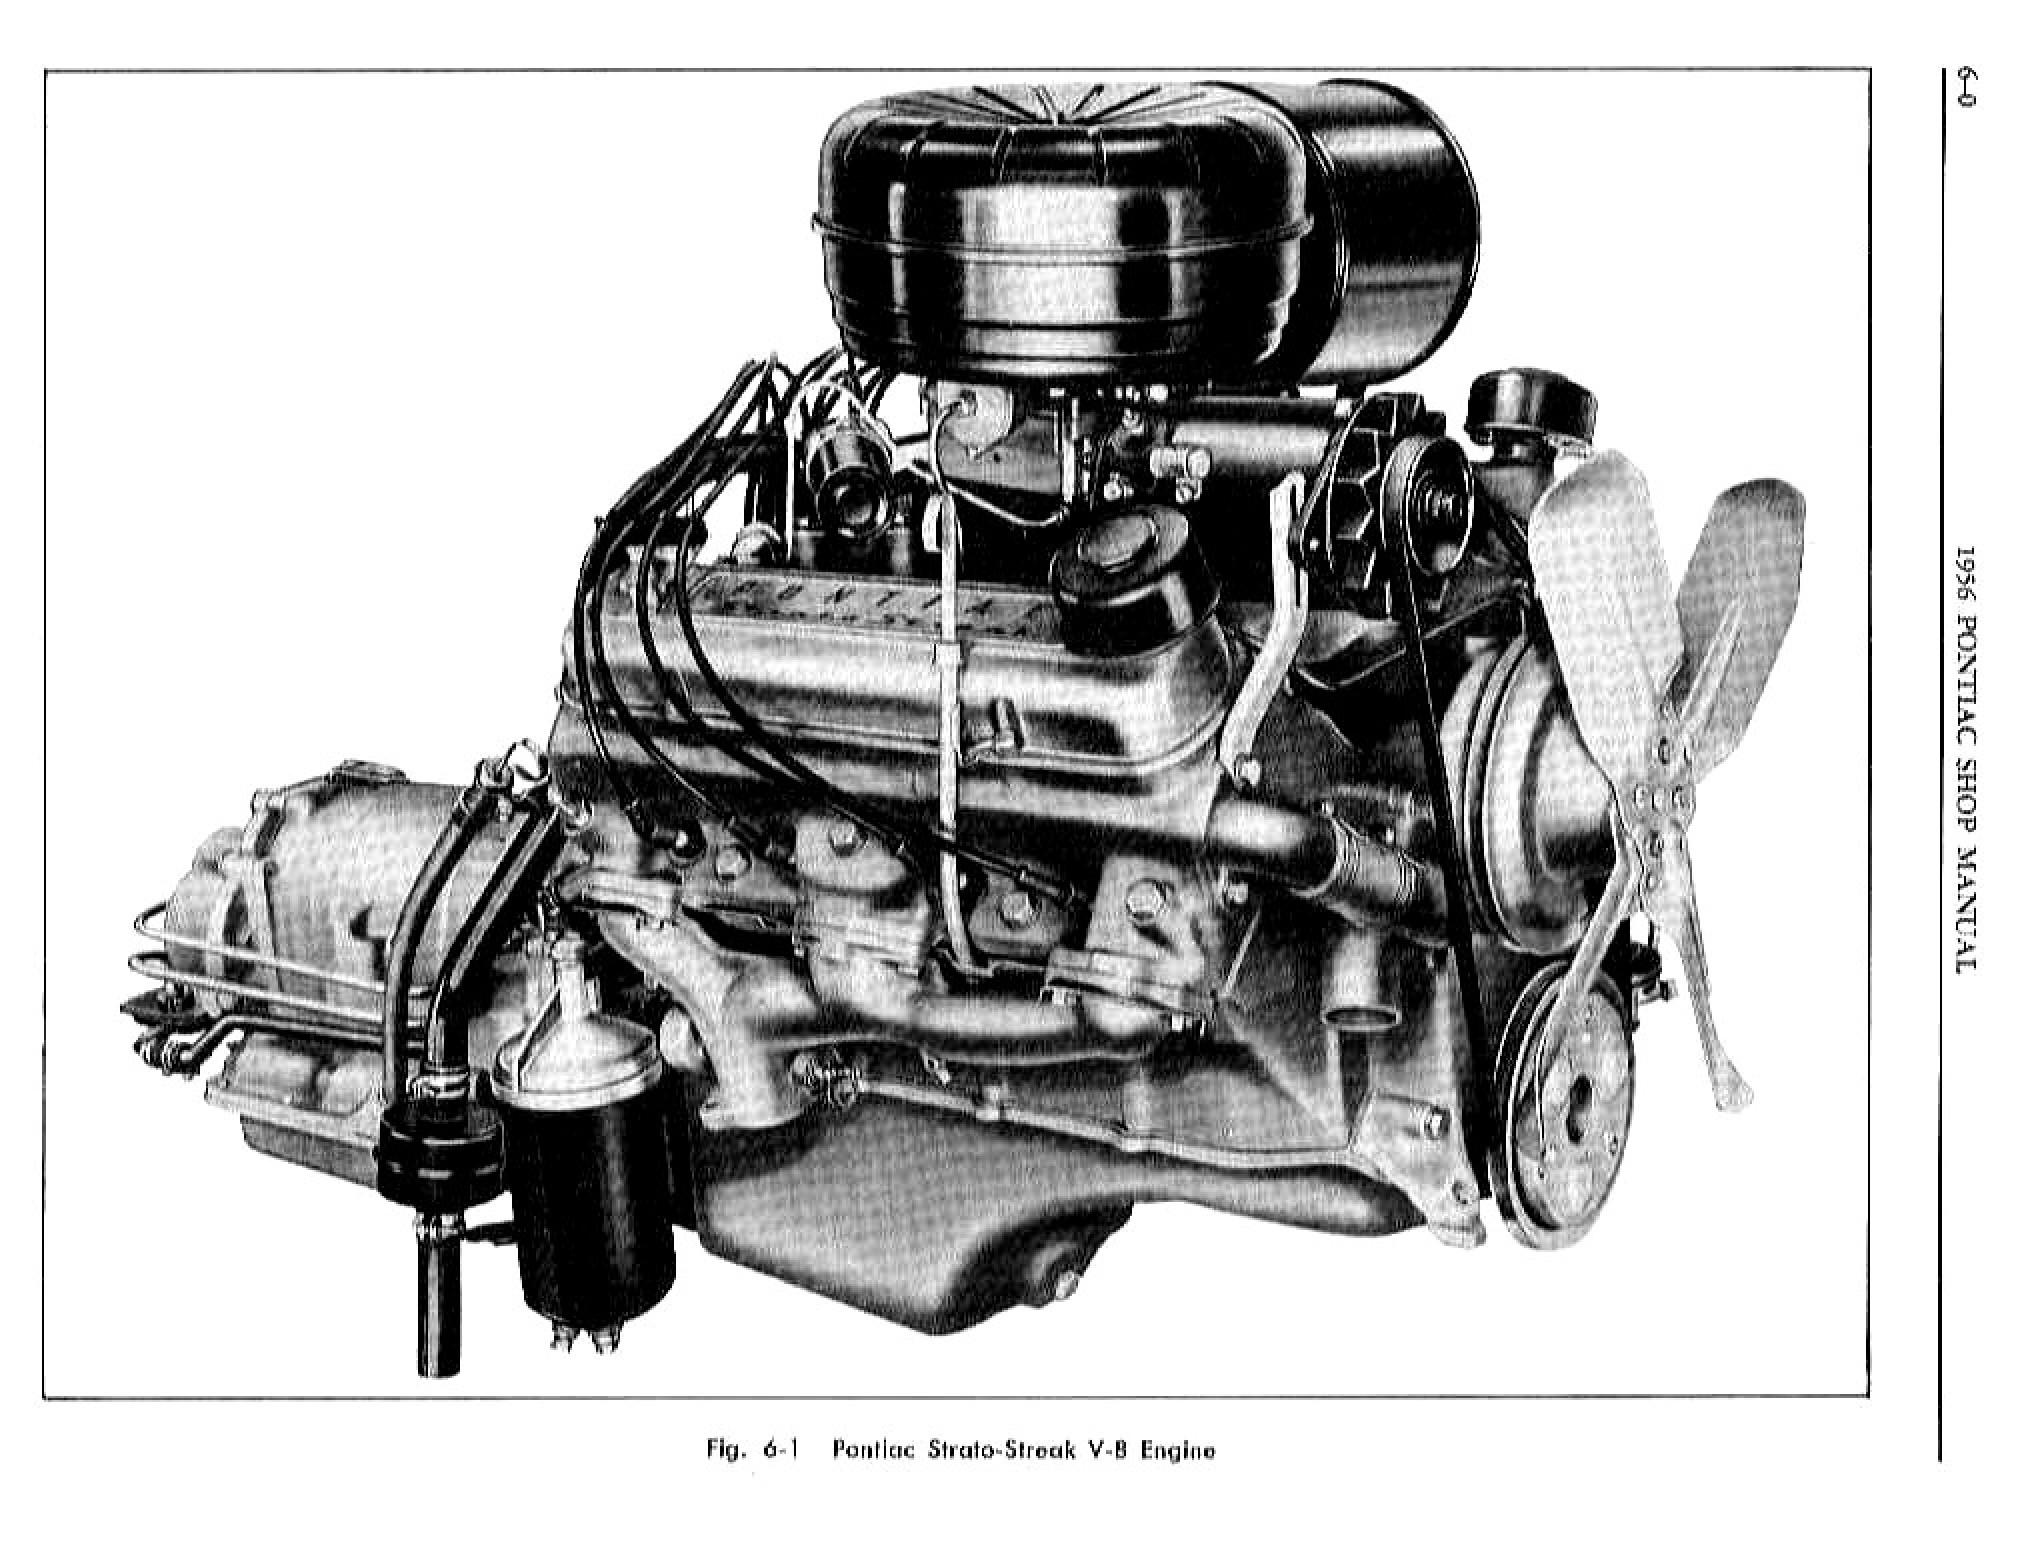 1956 Pontiac Shop Manual